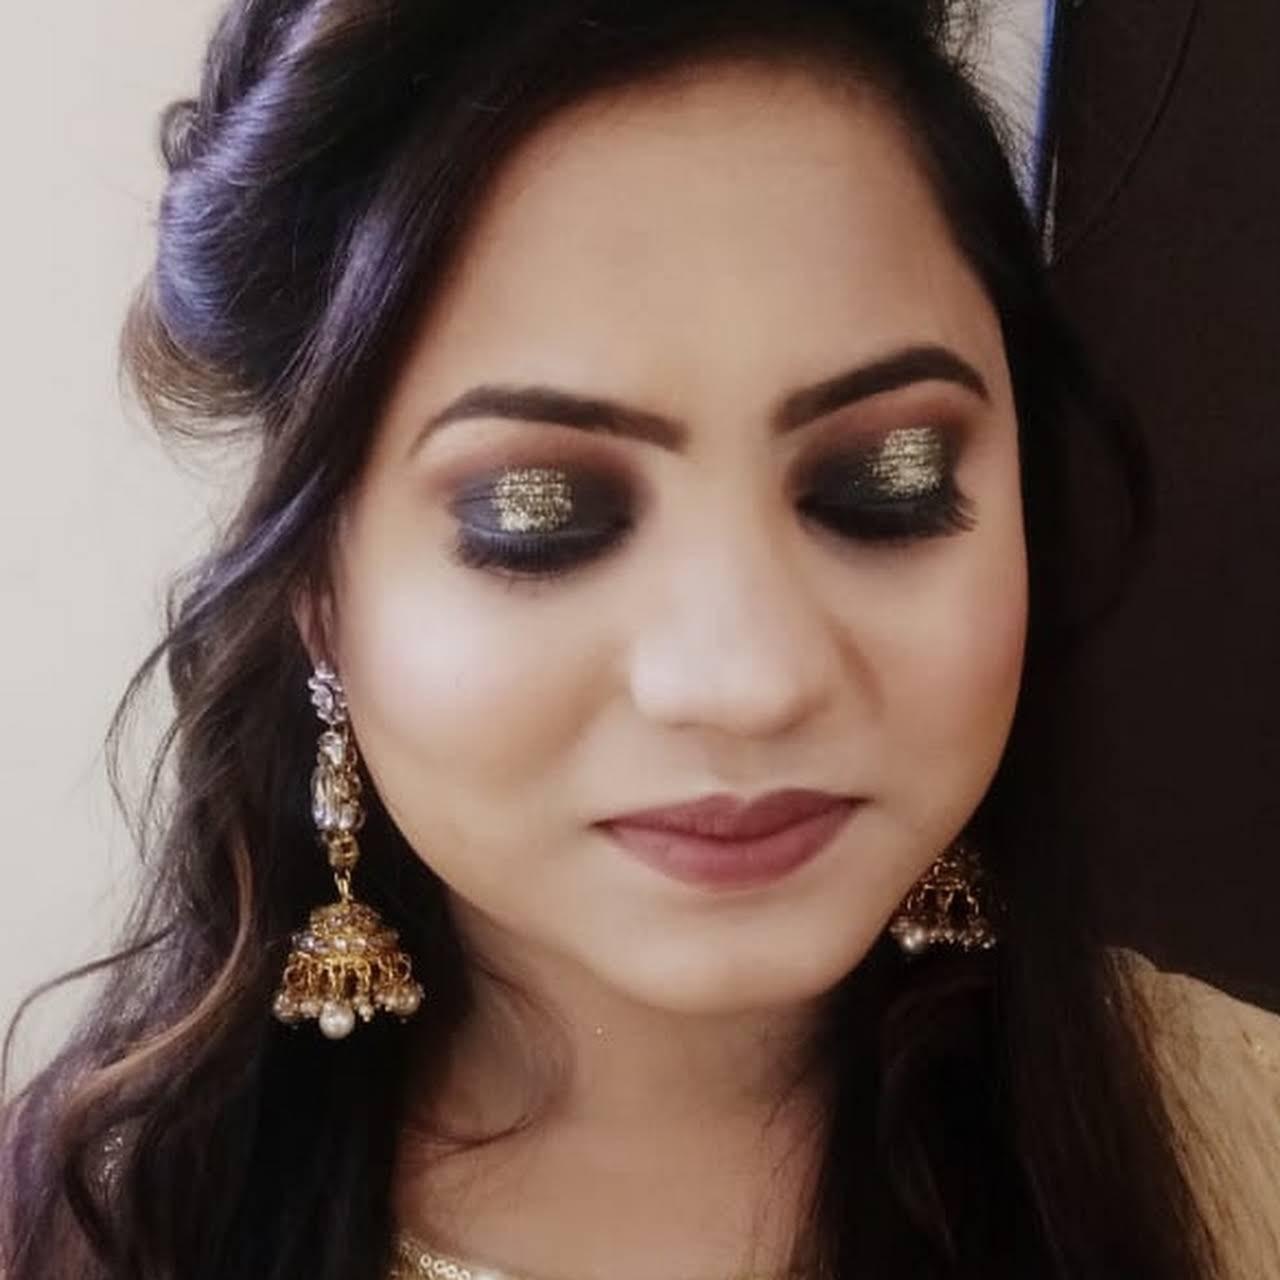 Shweta gargi makeup artist